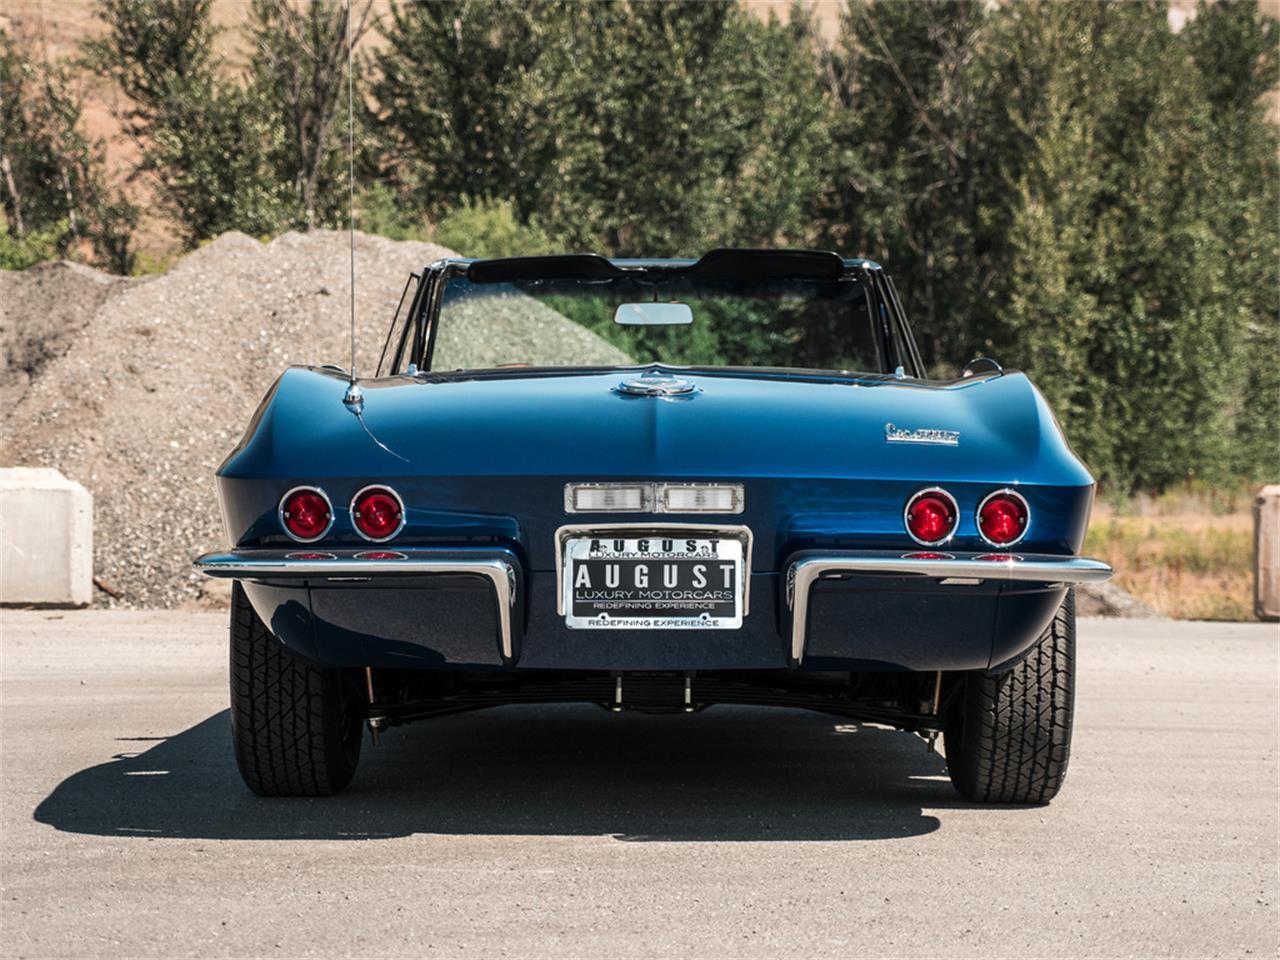 Large Picture of '67 Chevrolet Corvette located in British Columbia - $107,123.00 - QH6N